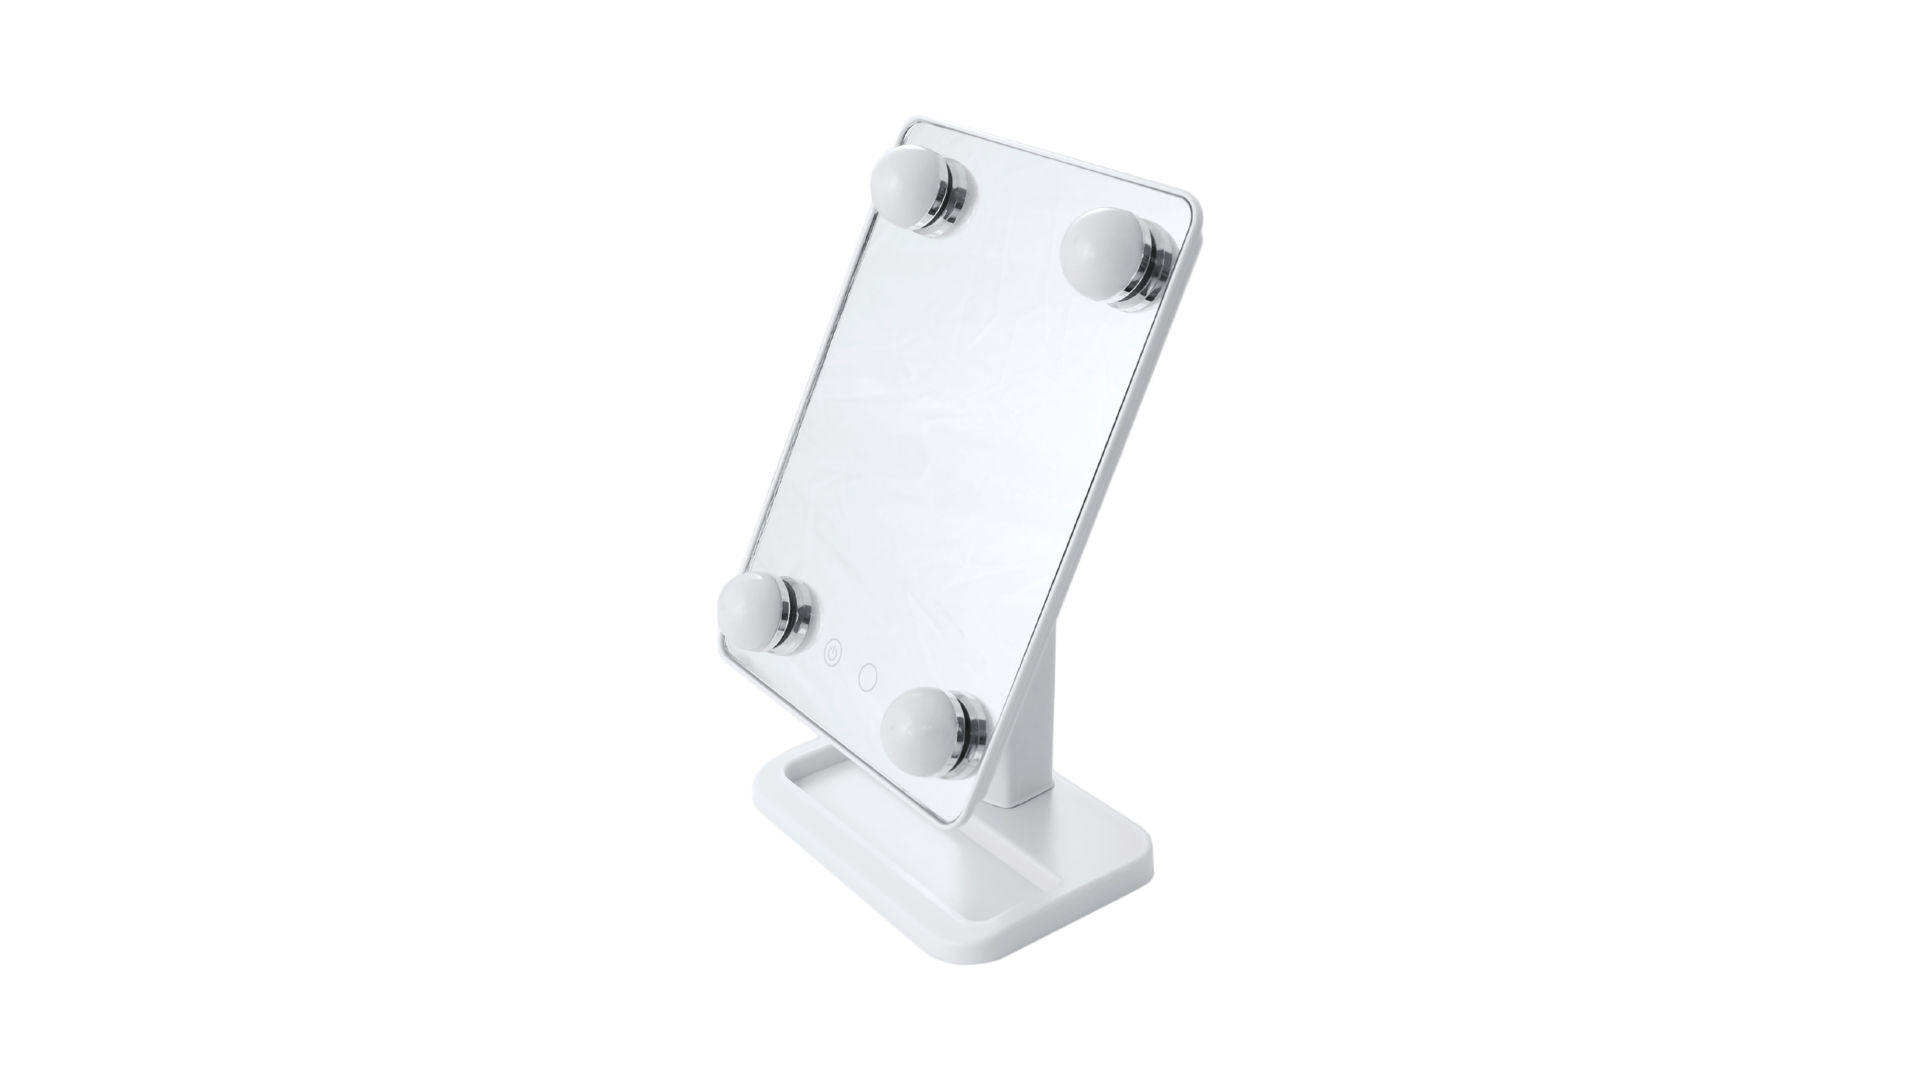 Зеркало с подсветкой Elite - 185 x 117 мм x 4 LED 5